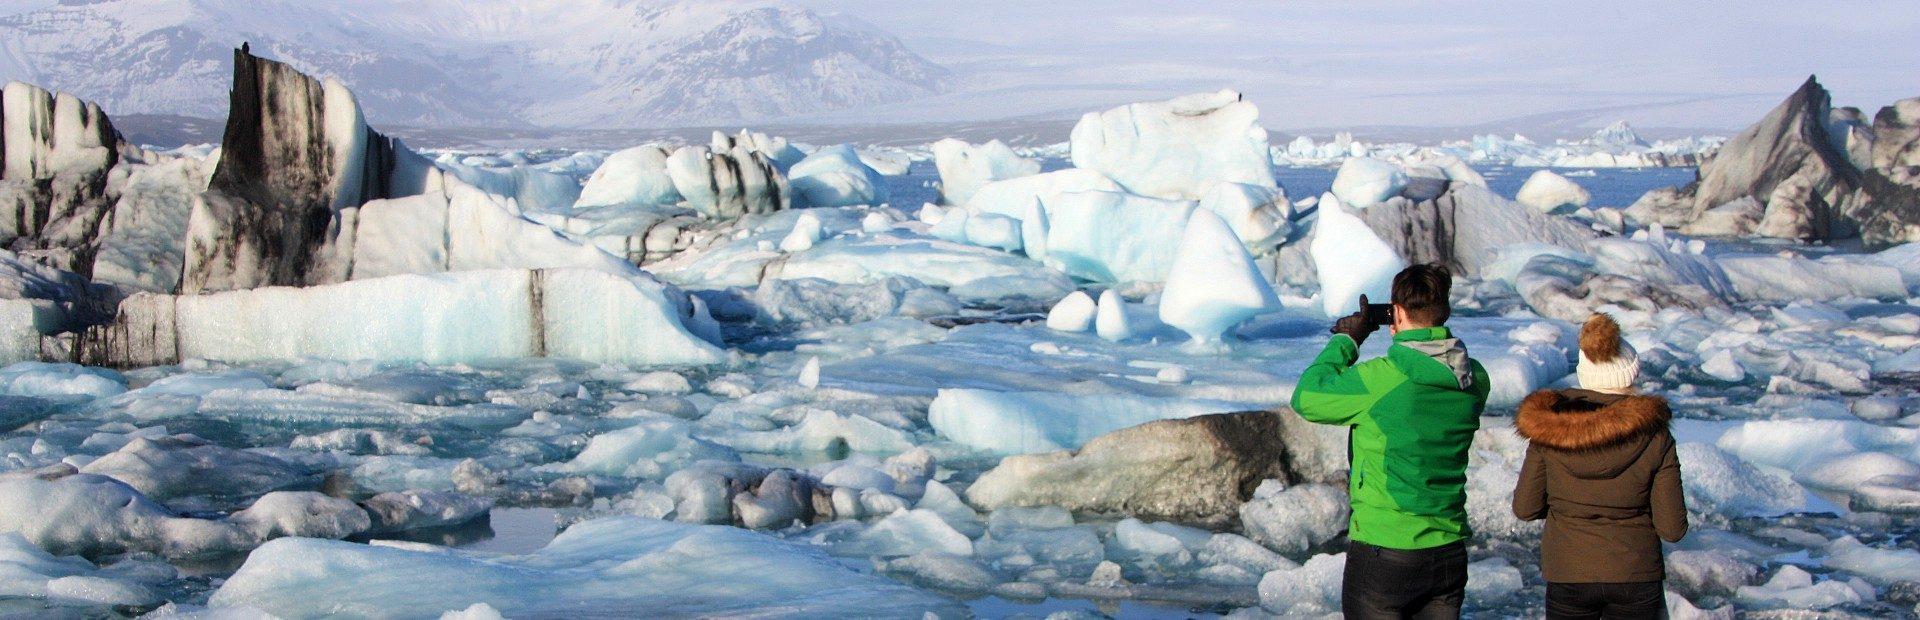 reisblog-ijsland-riksja